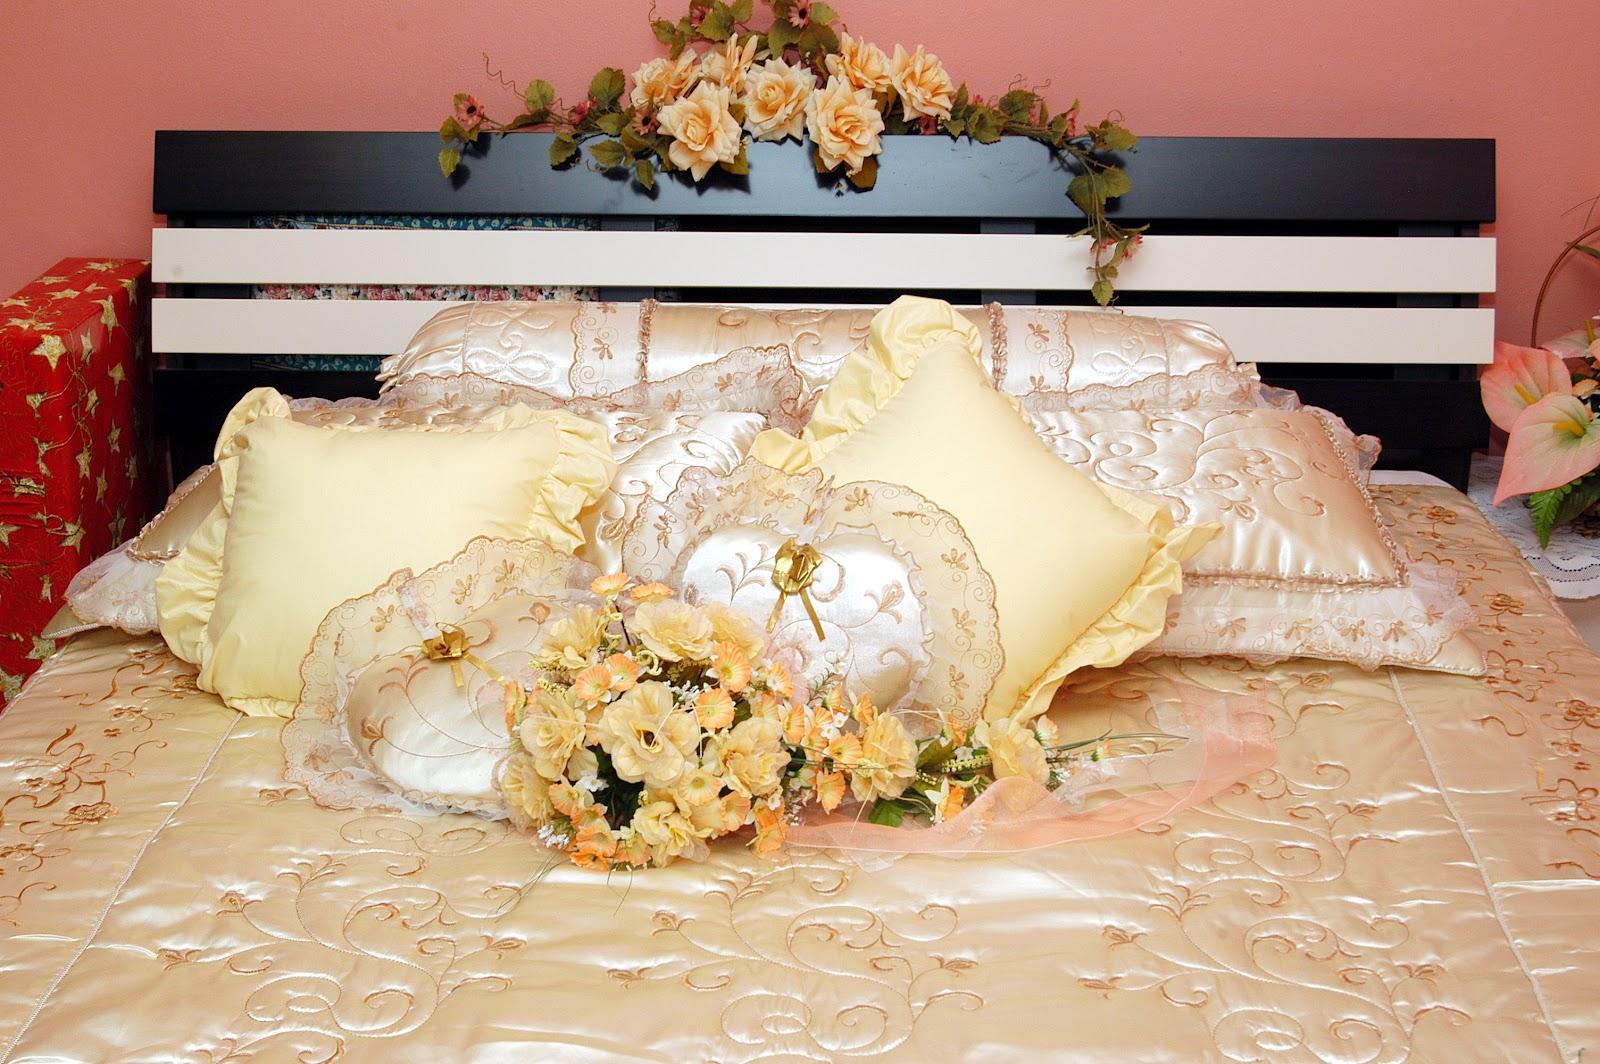 SARUNG BANTAL HIASAN / dekorasi: Dekorasi Perkahwinan